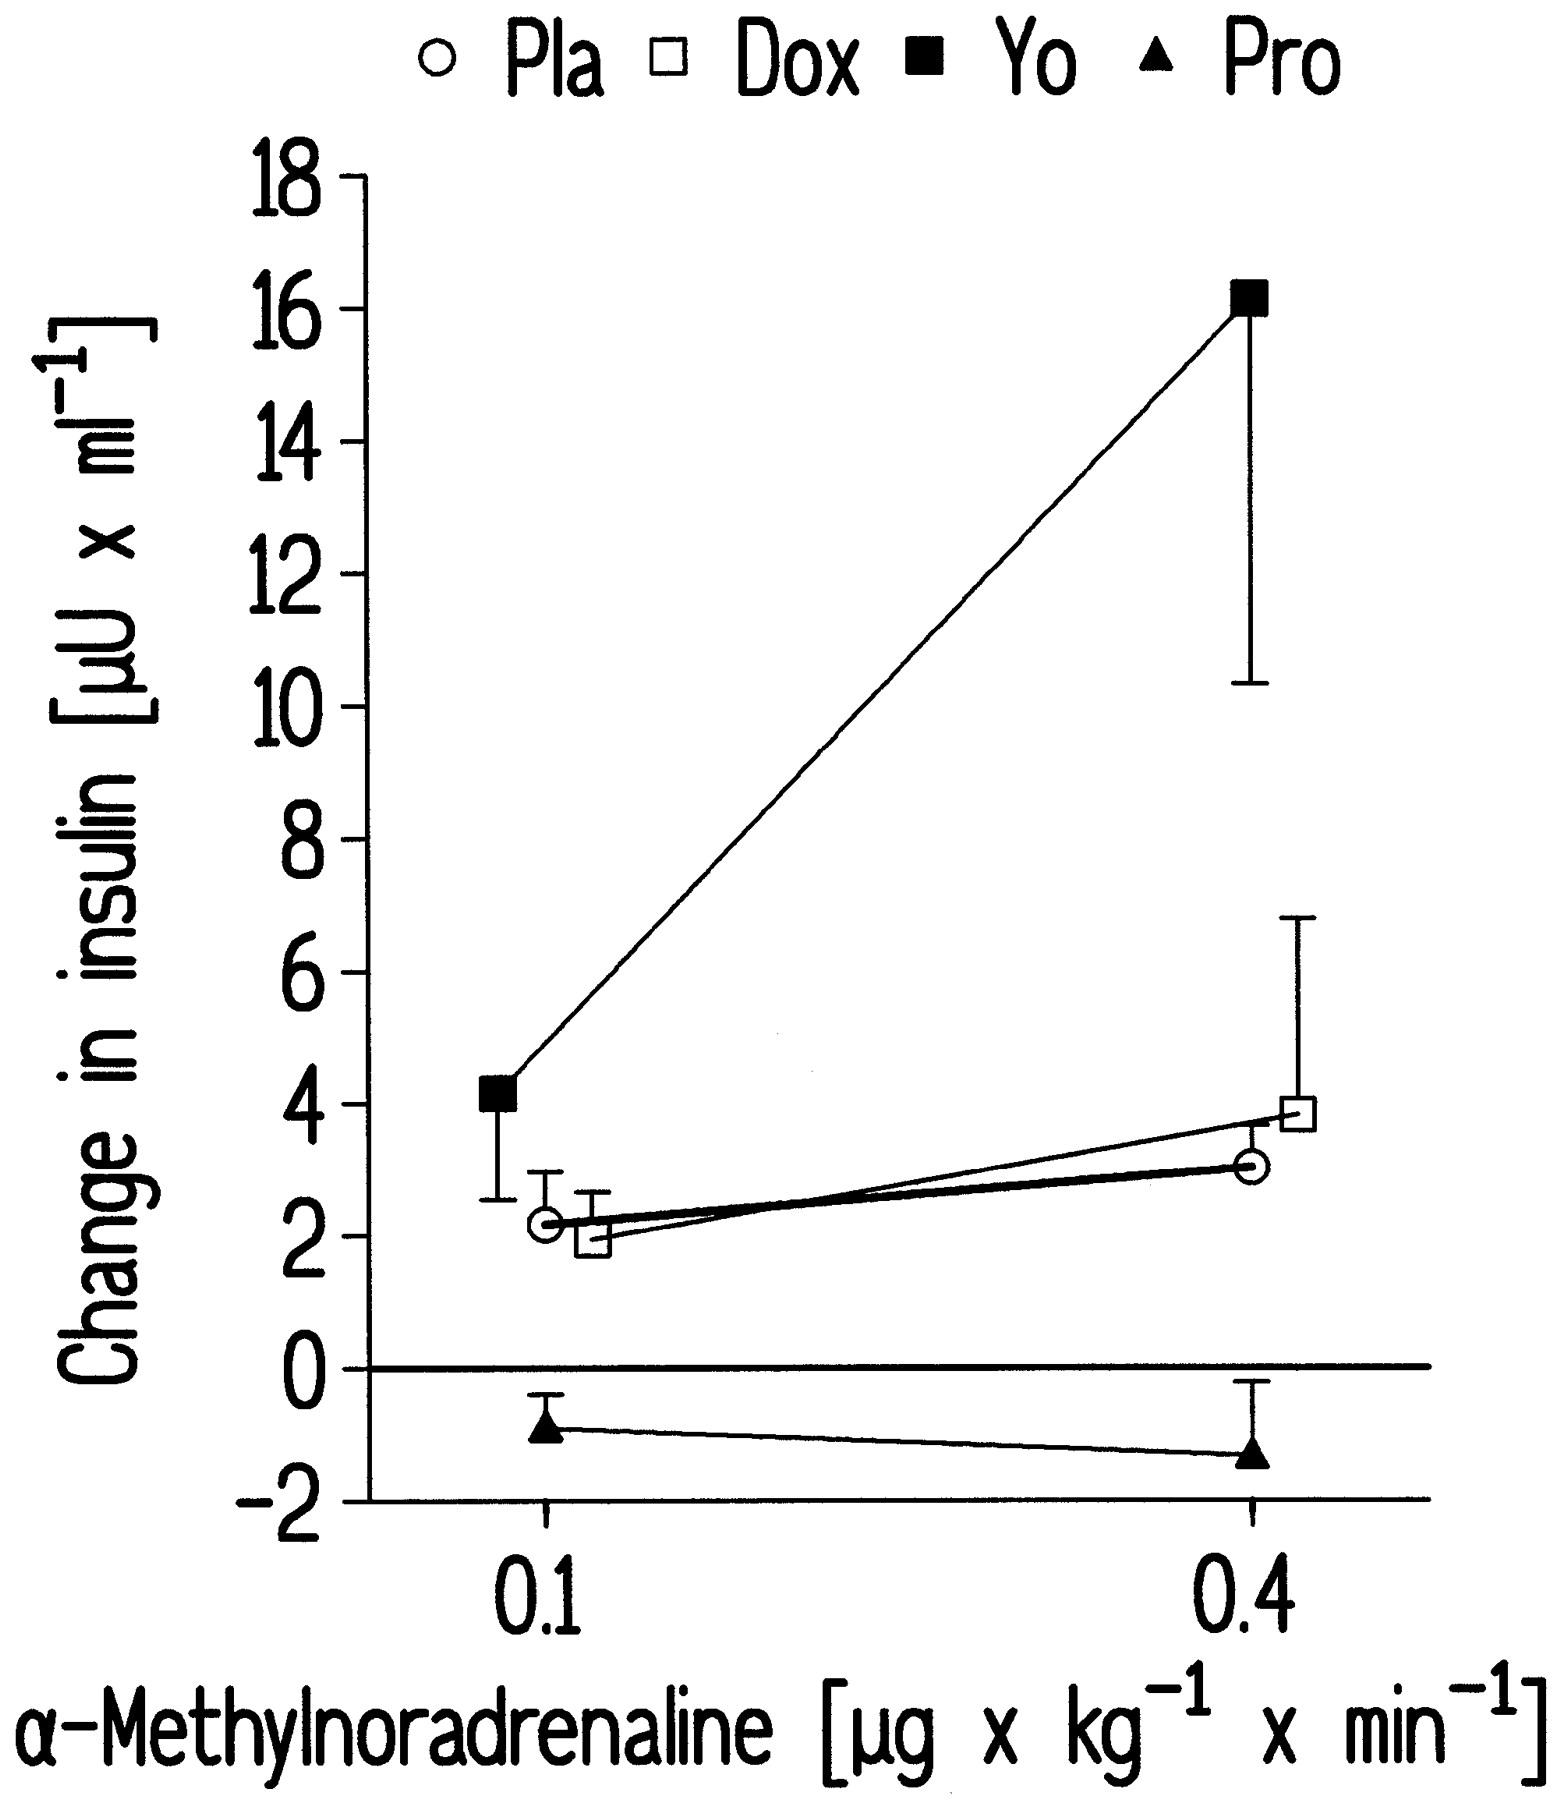 neurontin cost